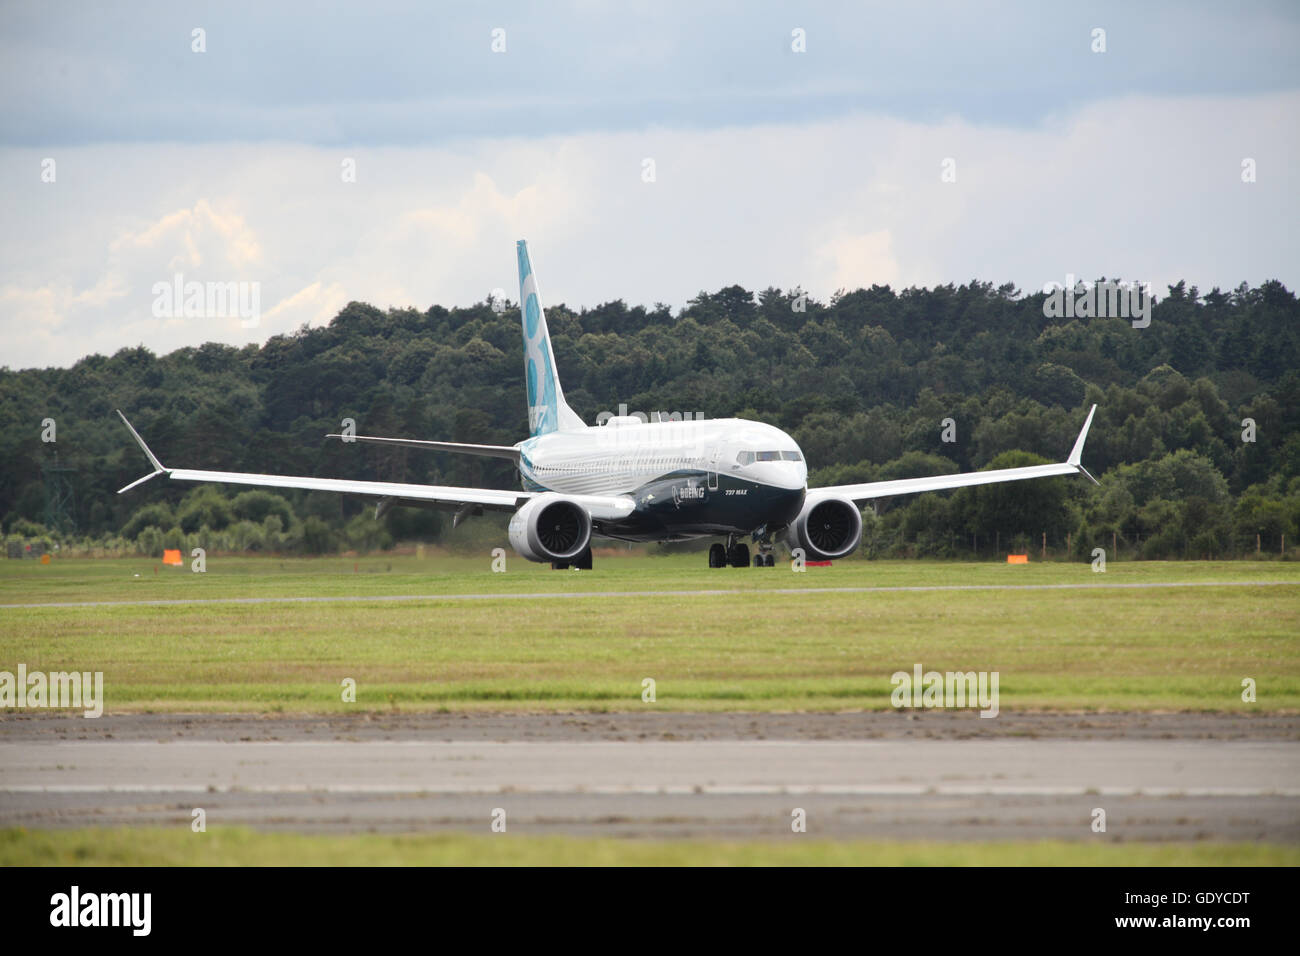 Boeing 737 Max at Farnborough Air Show 2016 - Stock Image